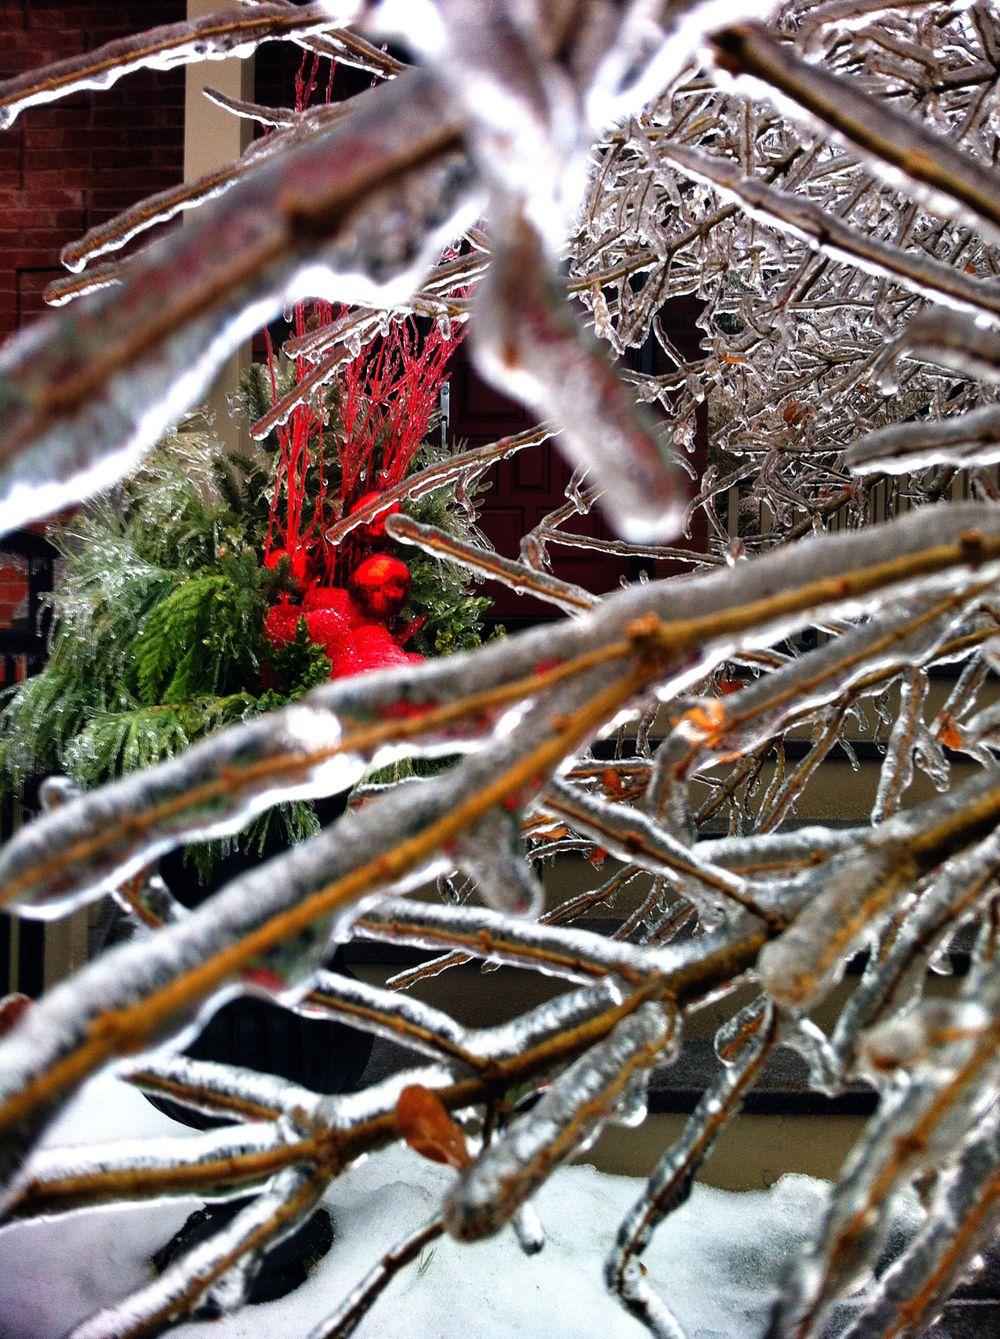 Icestorm-TO-2013.jpg